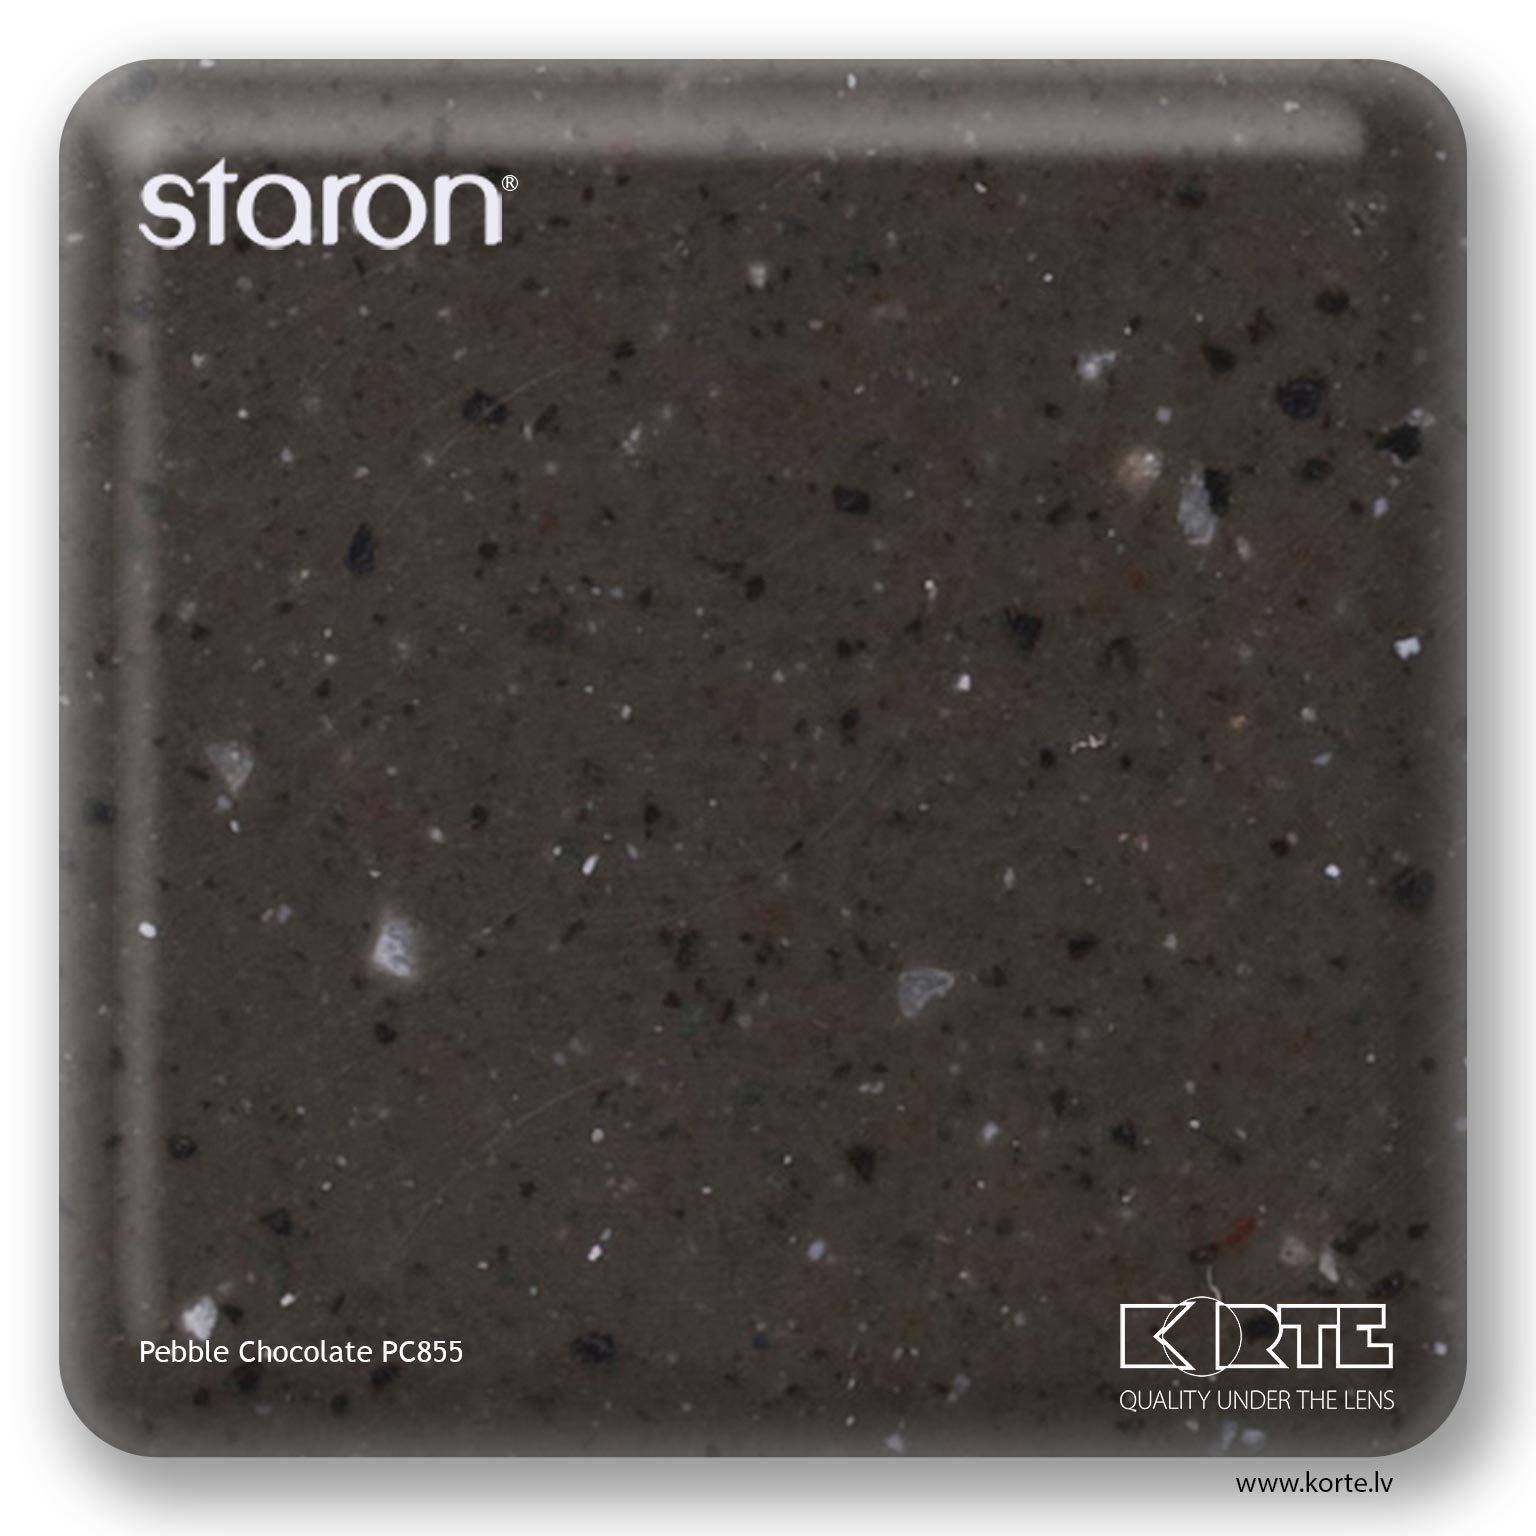 Staron Pebble Chocolate PC855